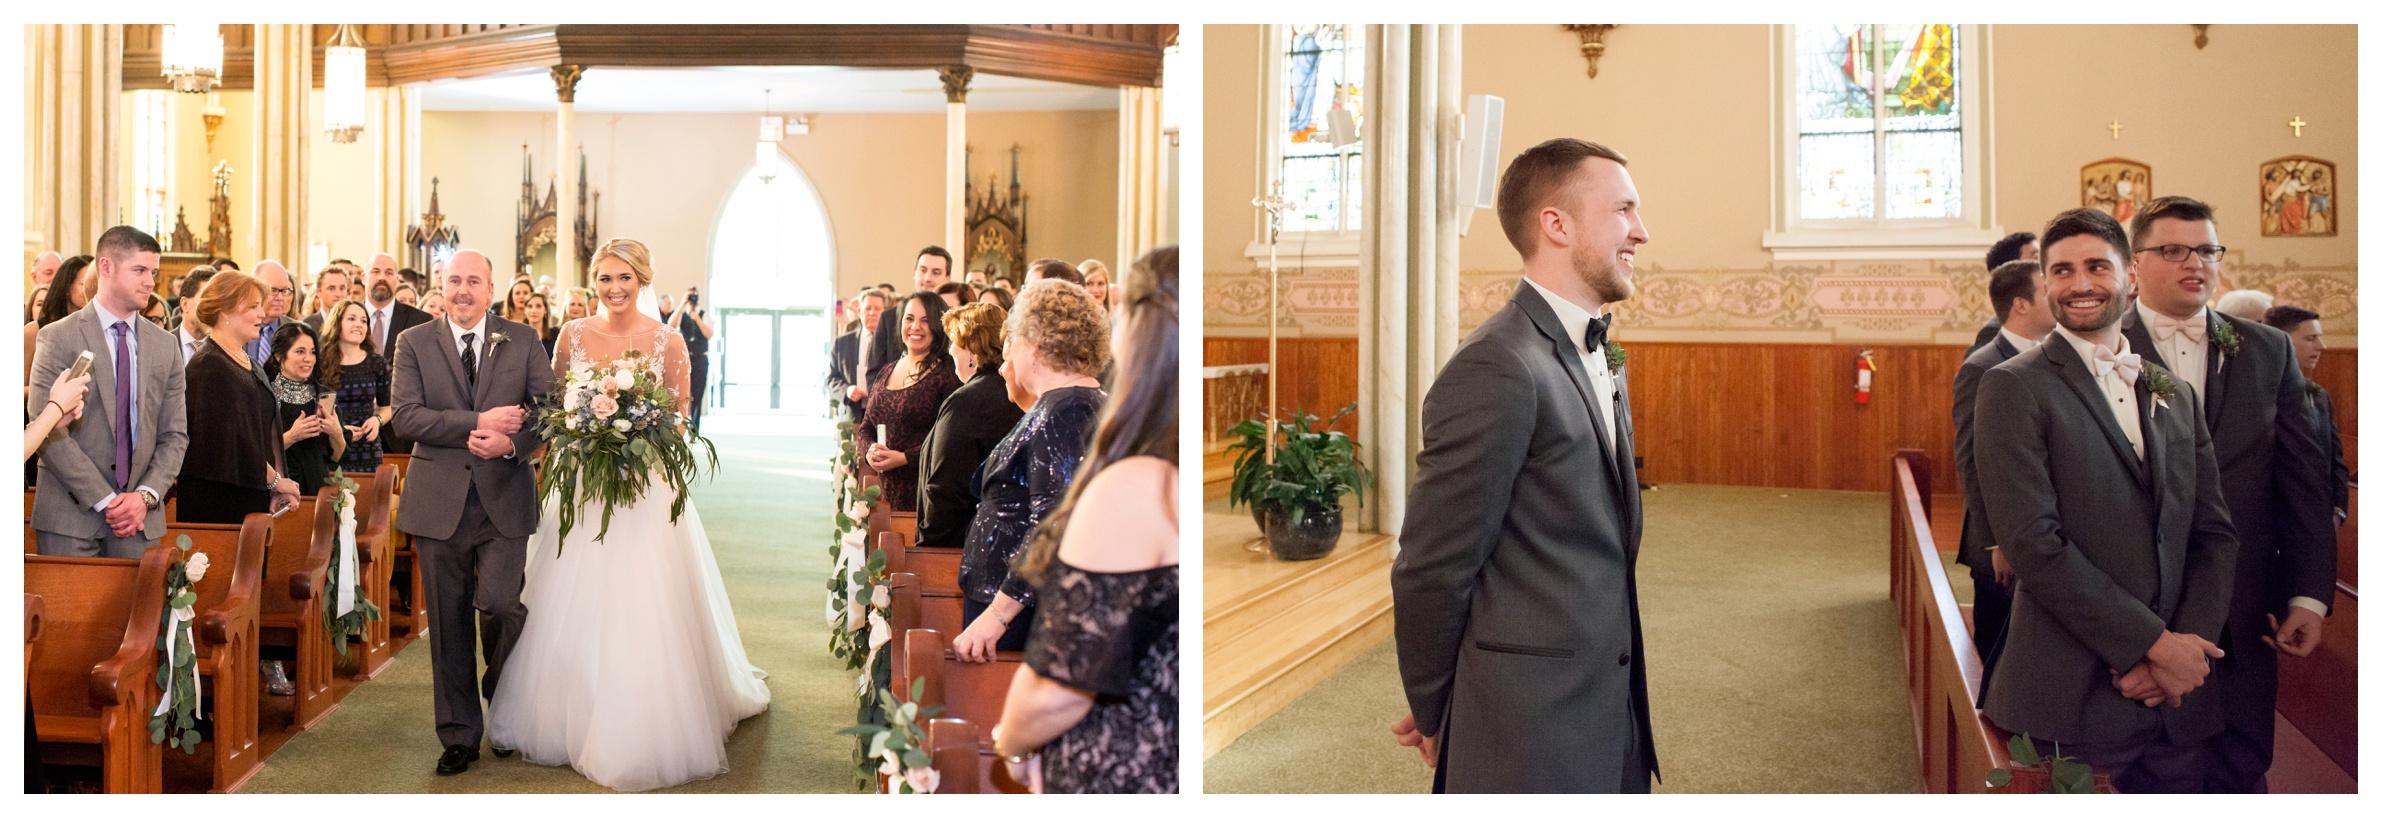 st-joseph-church-chicago-wedding